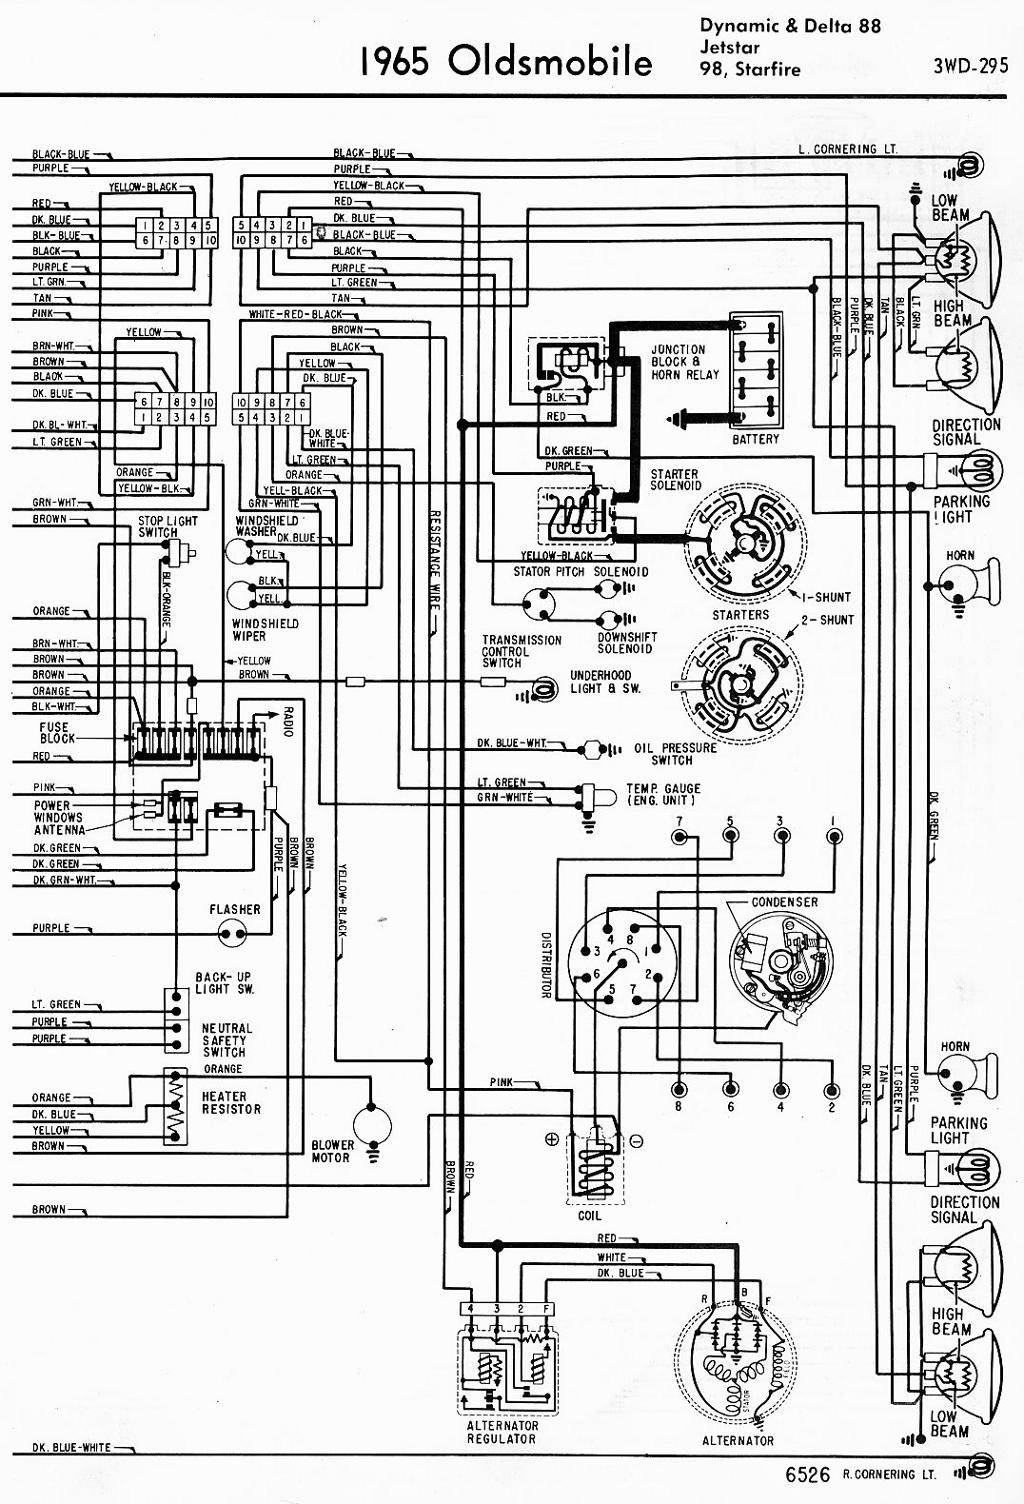 isuzu npr wiring diagram additionally 1997 oldsmobile 88 fuse box jeep wiring  diagram daihatsu alternator wiring diagram